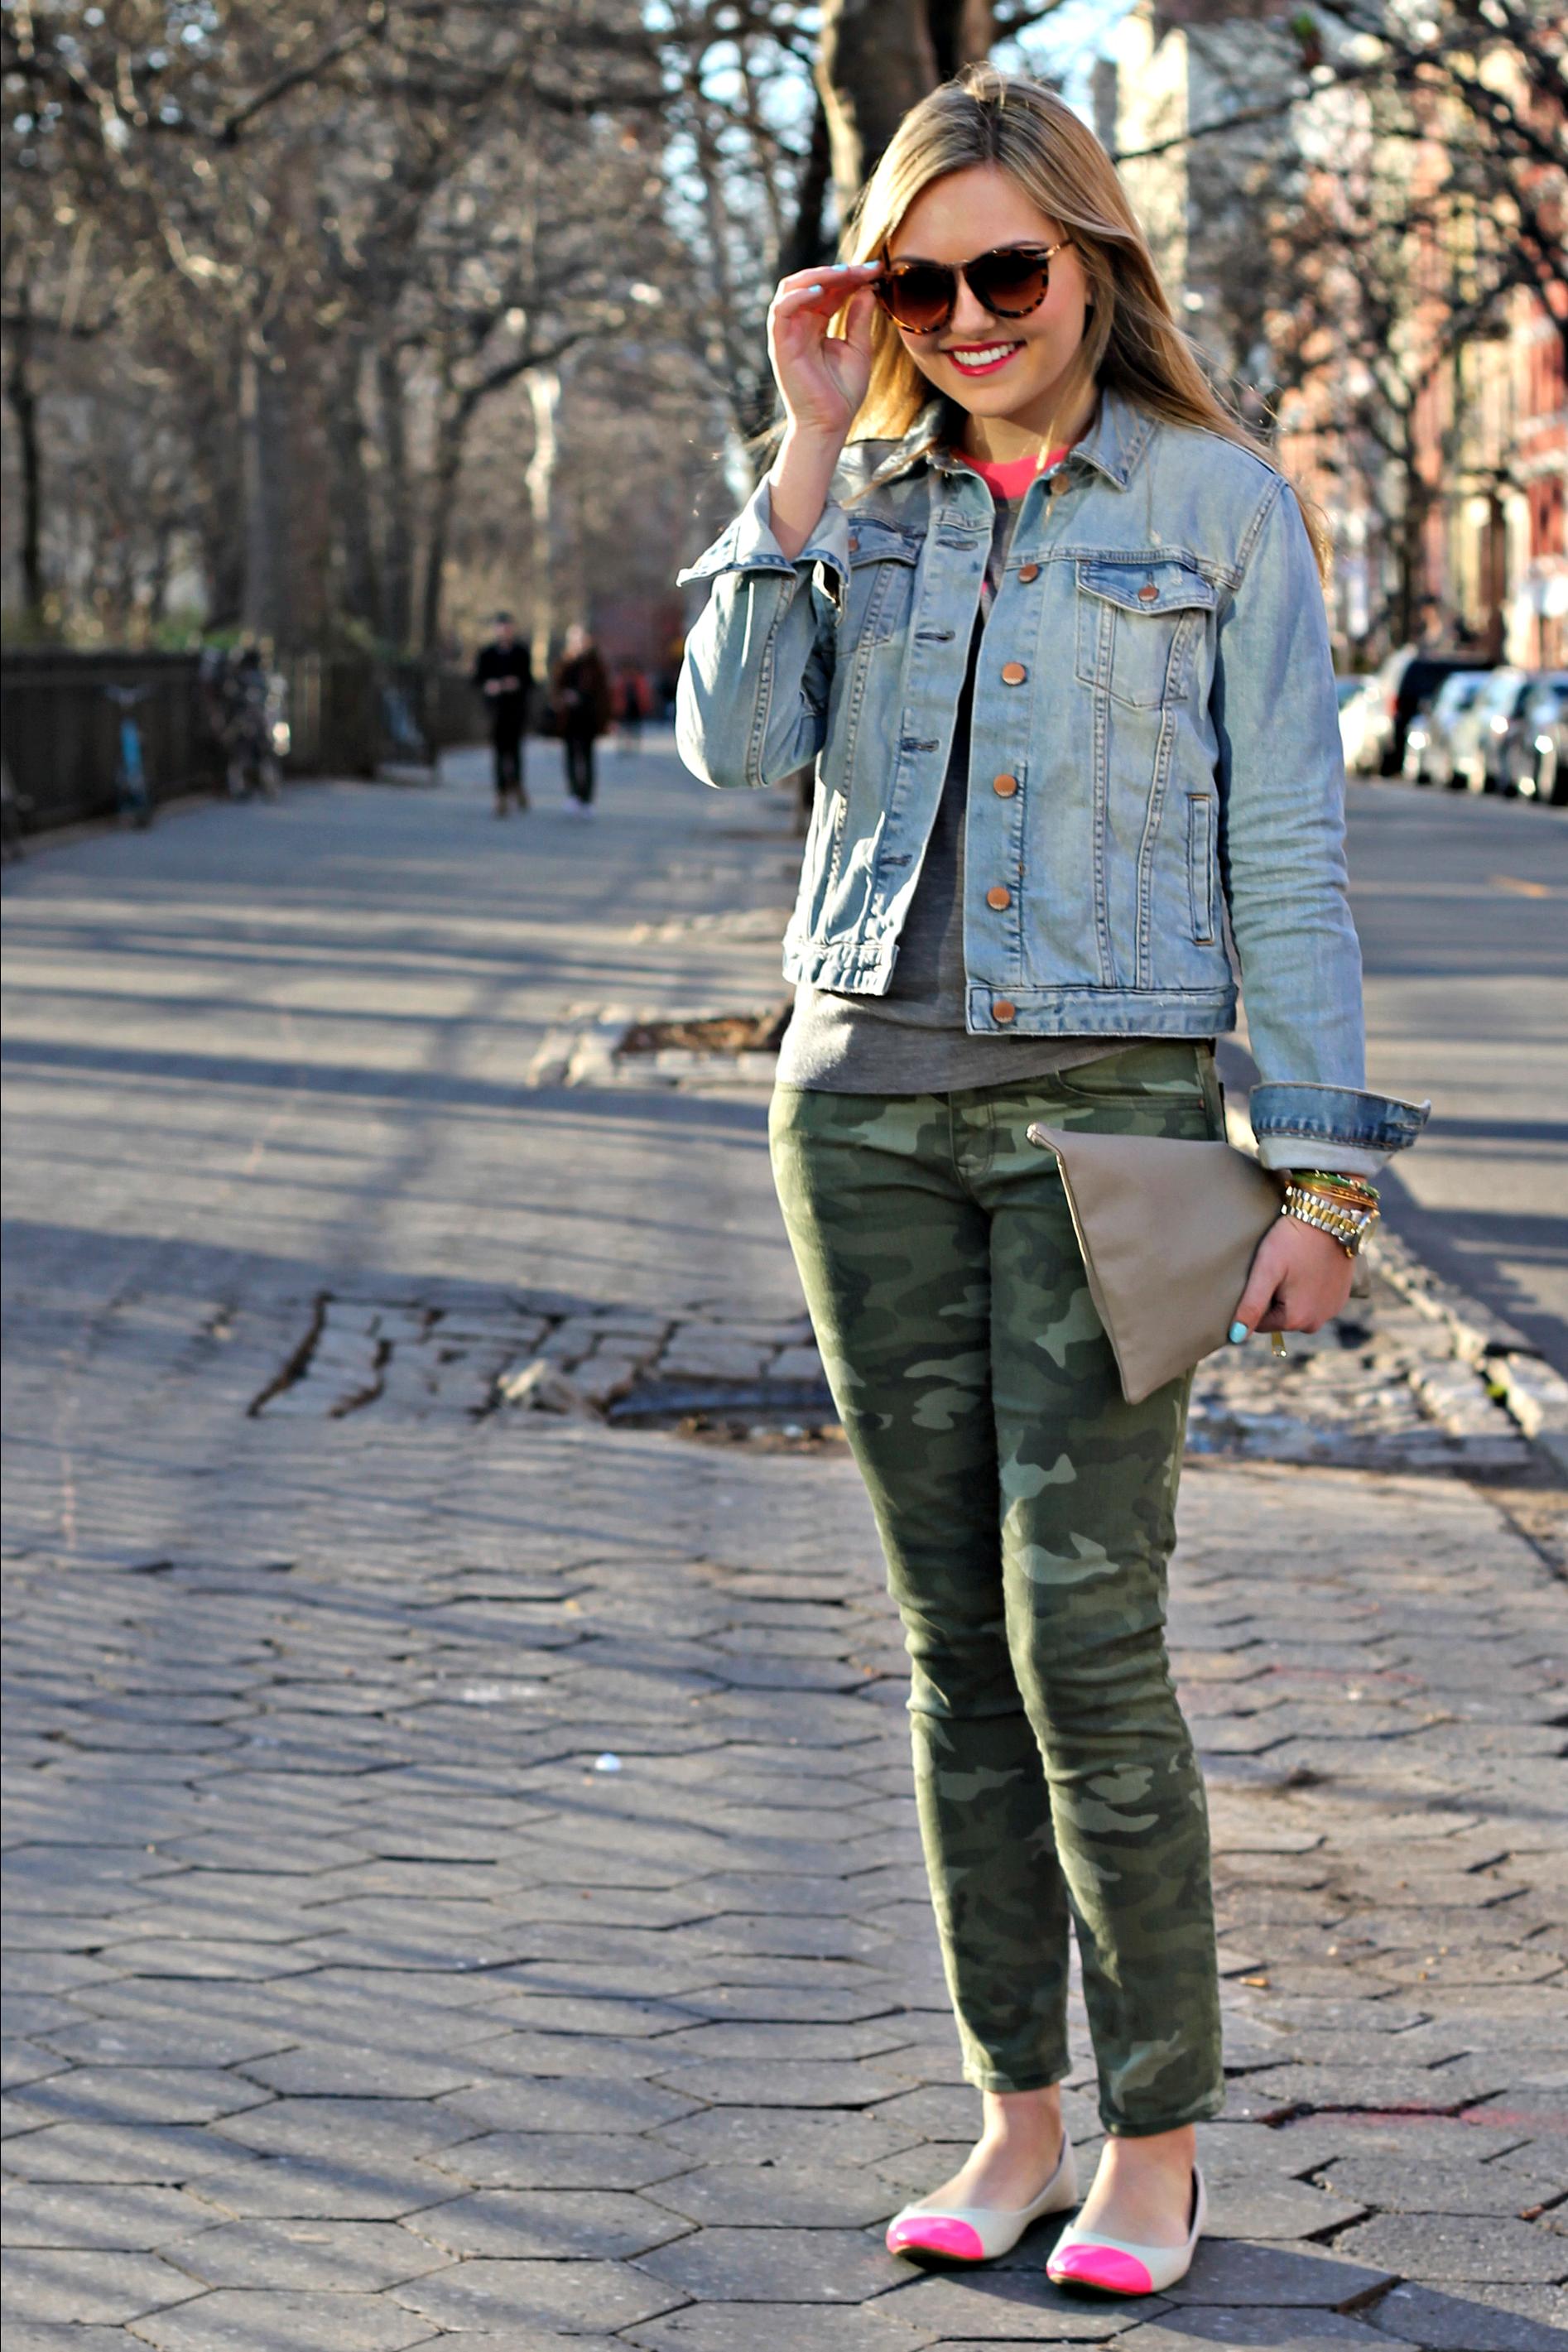 Denim Jacket + Camo Pants + Pops of Pink — bows & sequins